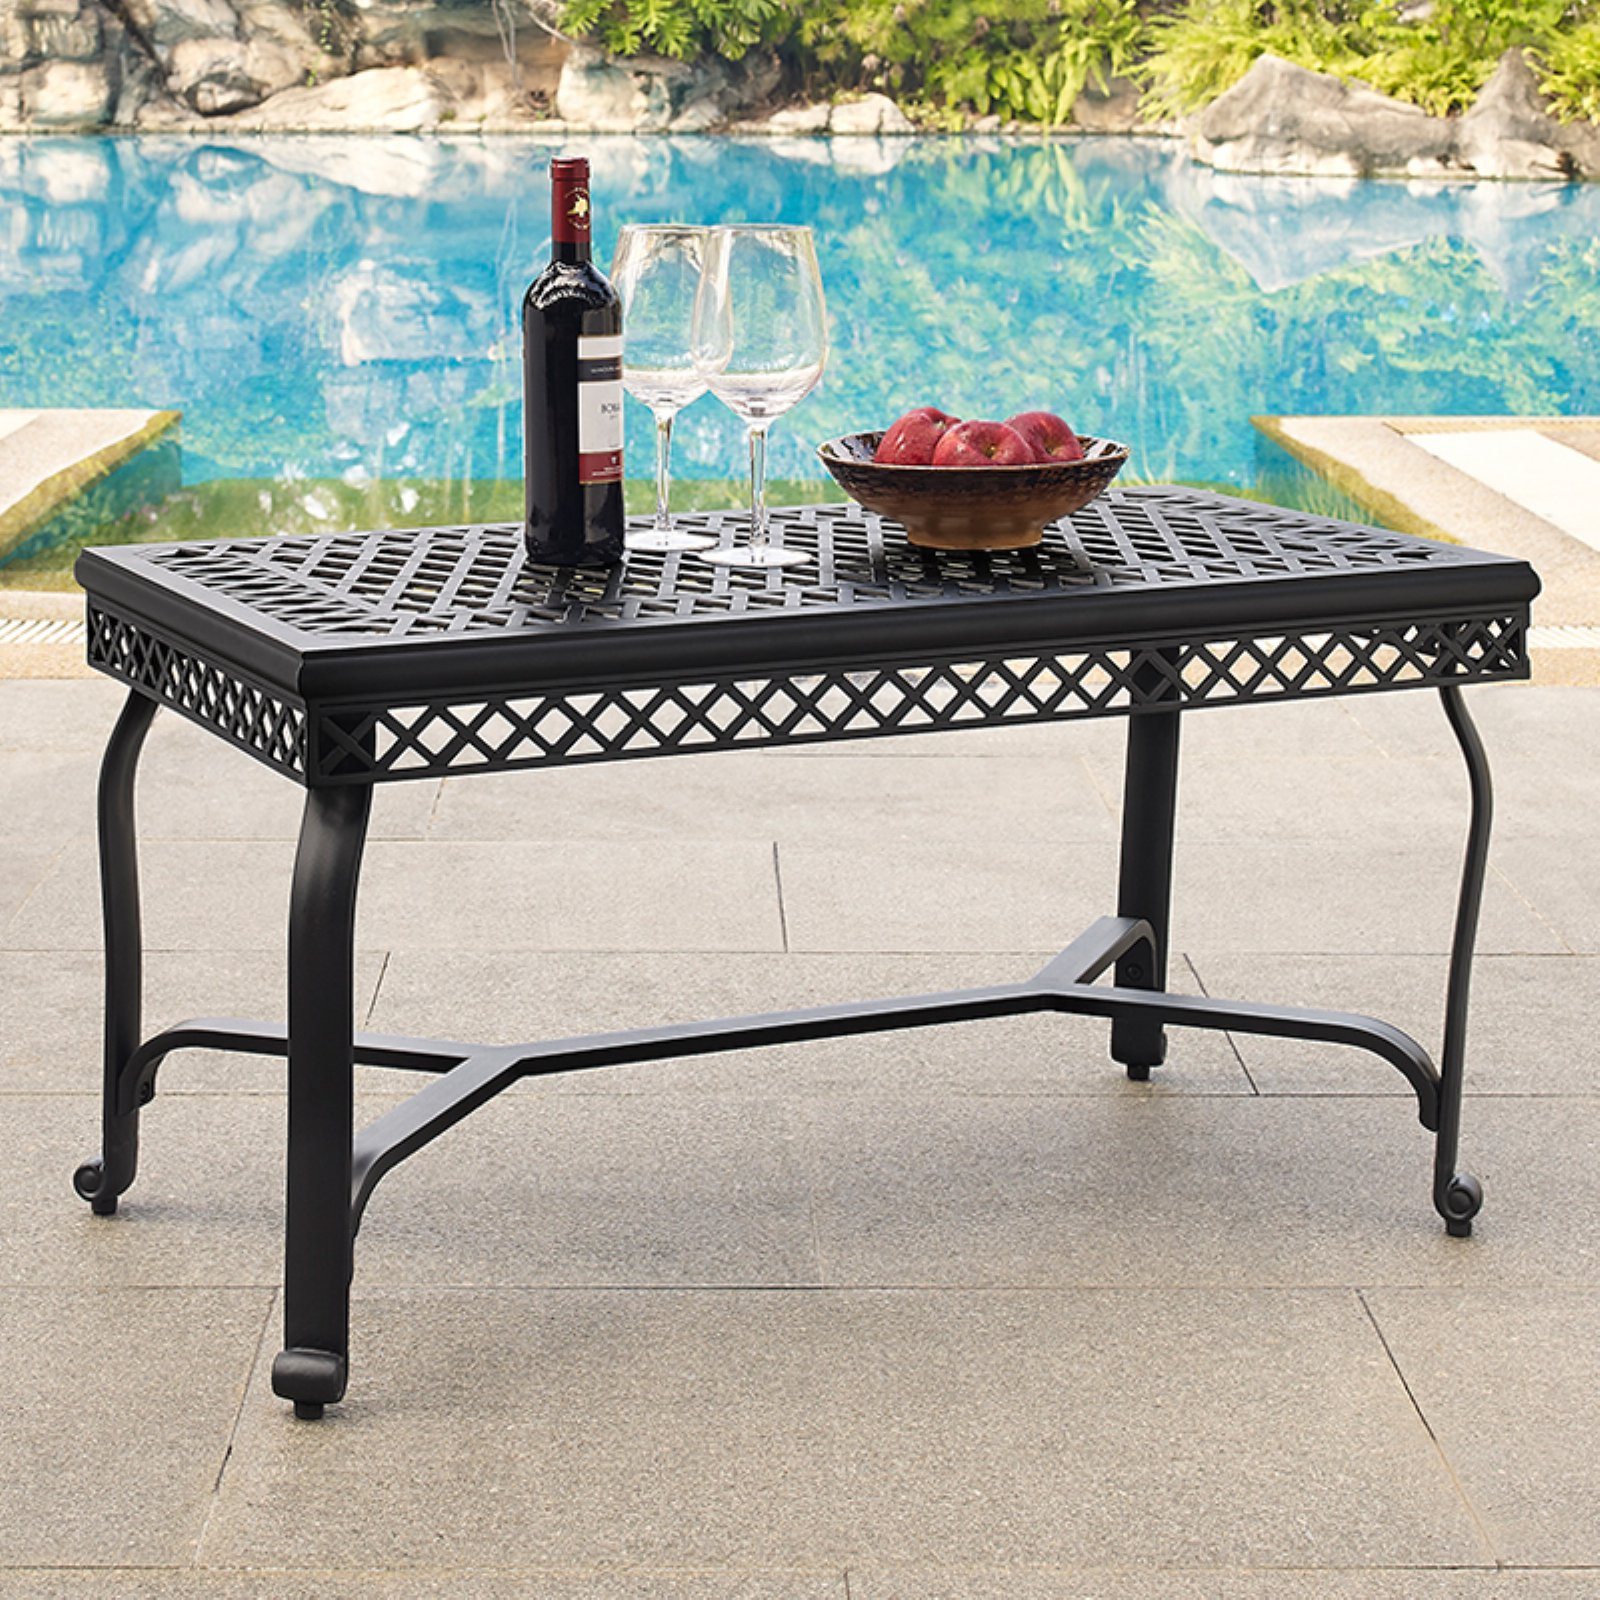 Crosley Portofino Cast Aluminum Coffee Table, Charcoal Black Finish by Crosley Brands, Inc